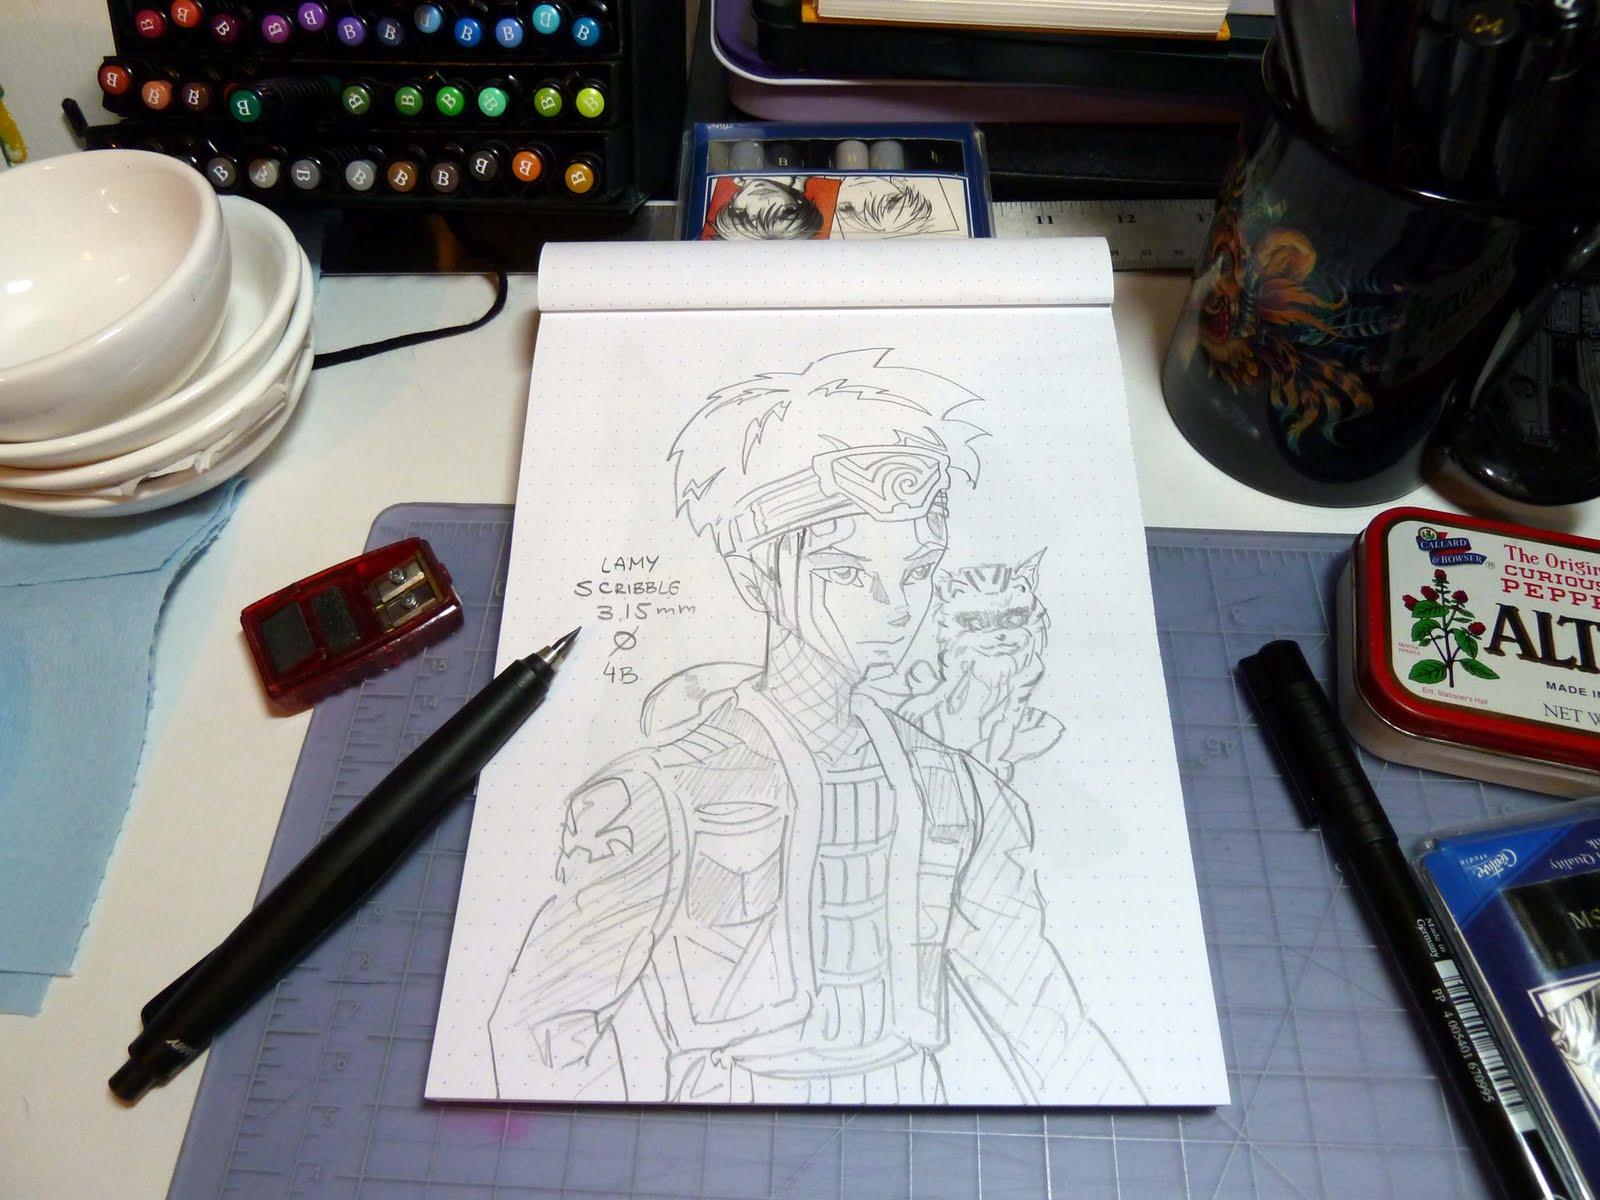 http://2.bp.blogspot.com/_idUARdOEJAk/TB54FZ_ITLI/AAAAAAAAHWc/TyQuRwPptE0/s1600/Lamy+Scribble+3mm+4B+sketch+on+Rhodia+dotPad.jpg